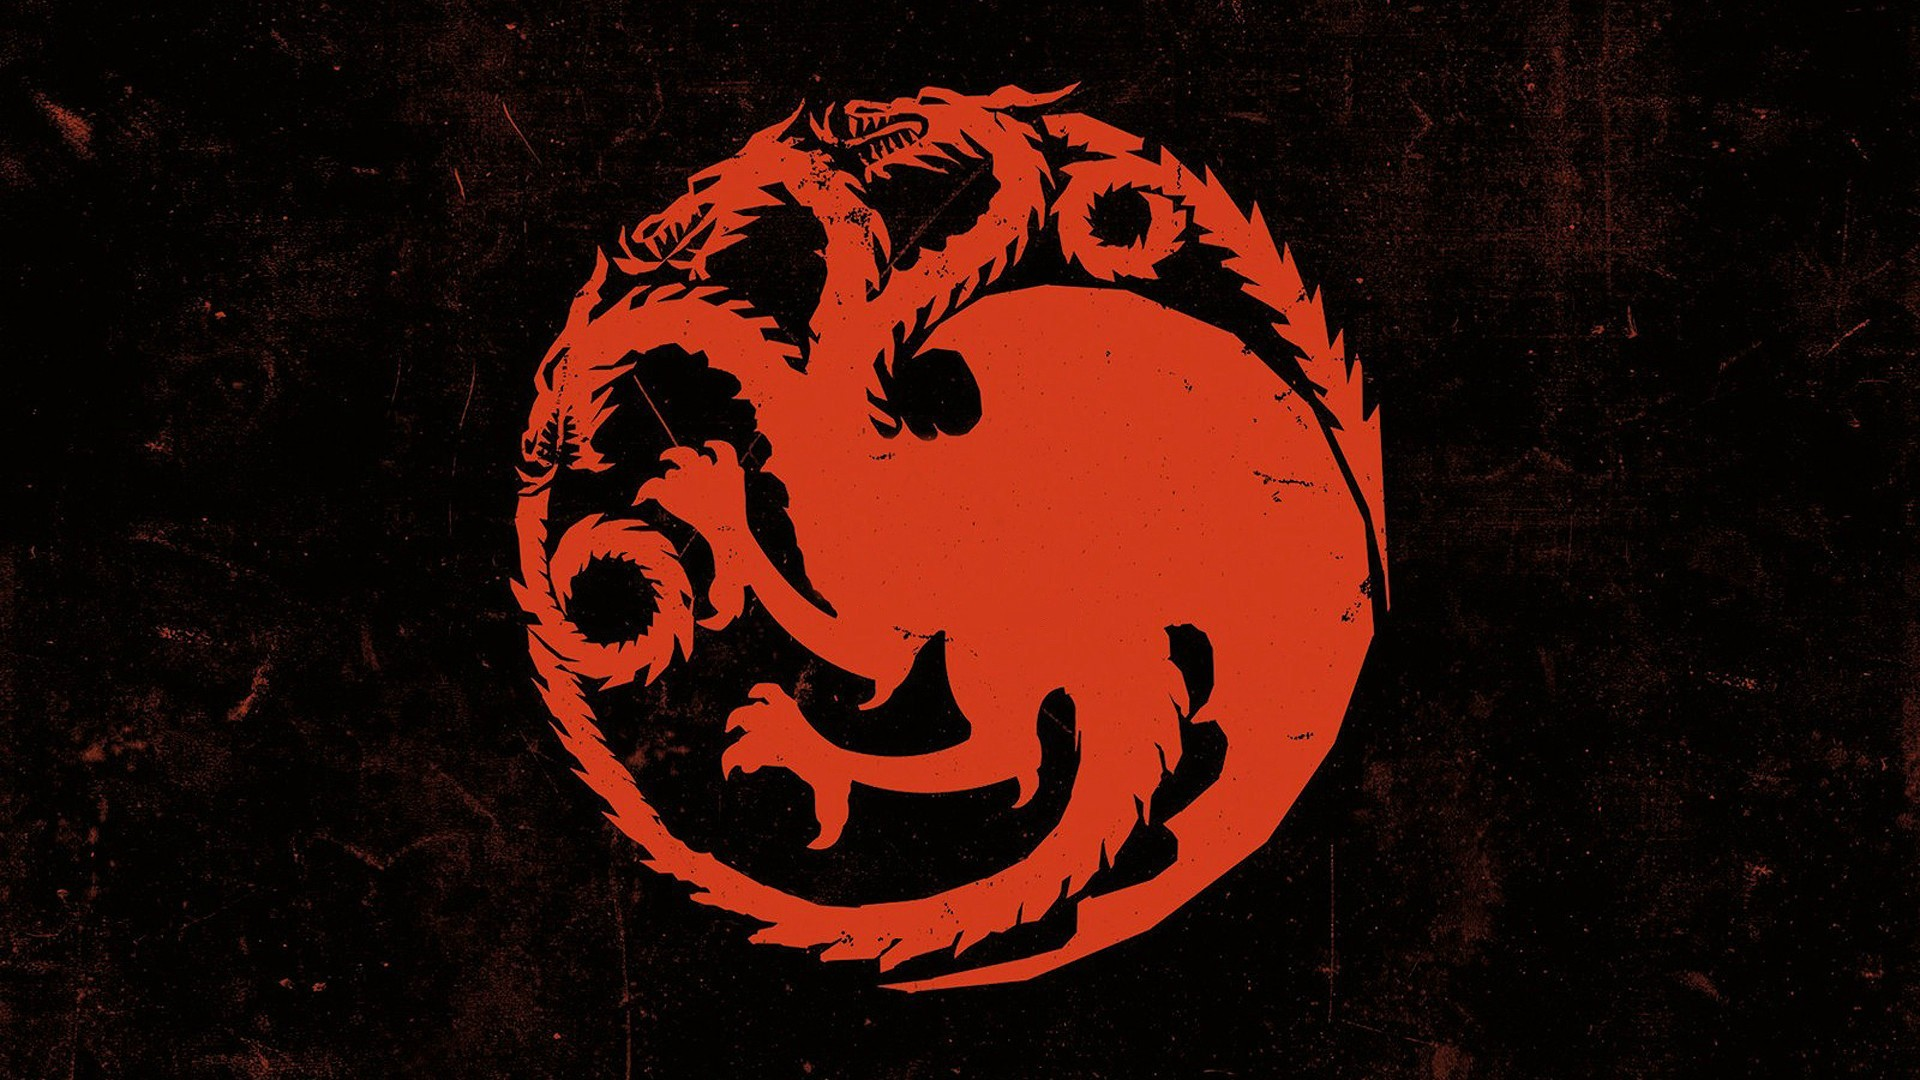 Game Of Thrones House Targaryen Wallpaper 1920x1080 66927 Wallpaperup